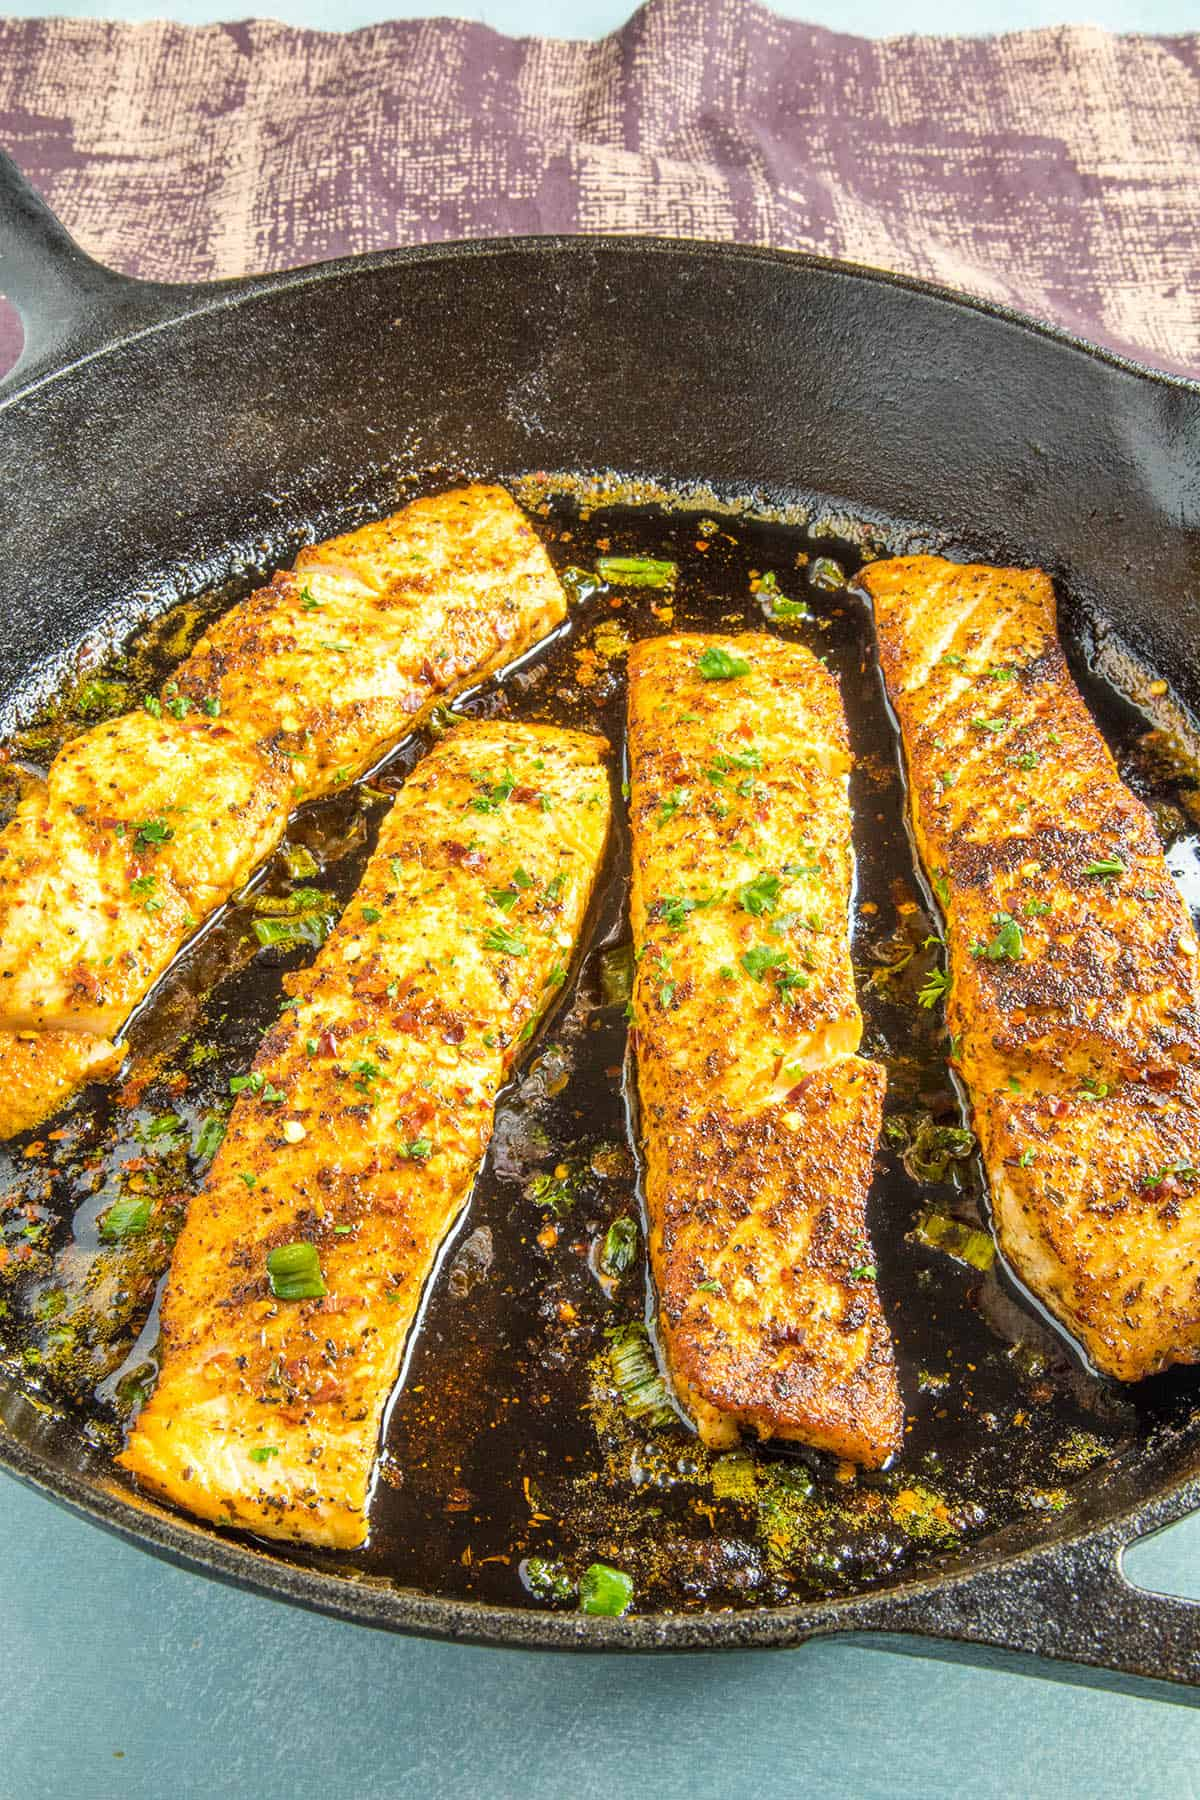 Blackened Salmon in a pan with garnish